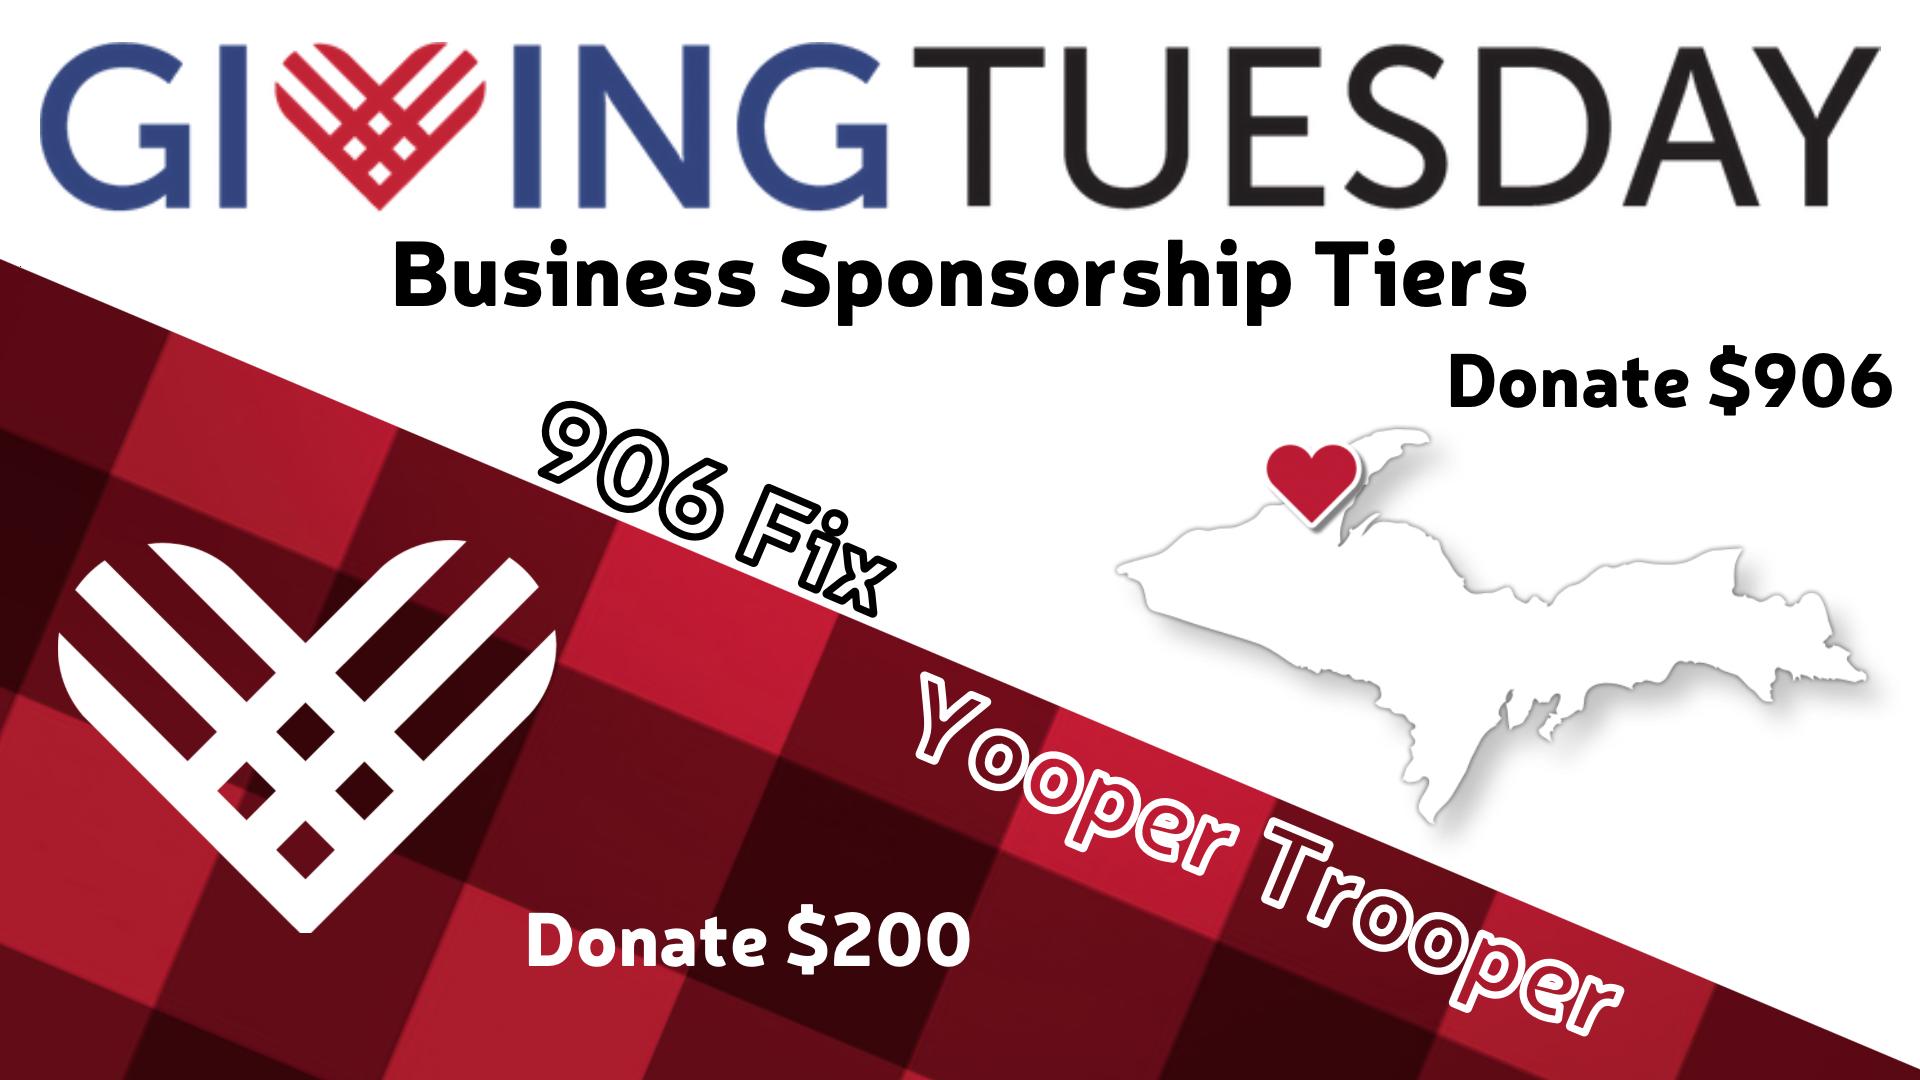 Business Sponsorship Tiers Website